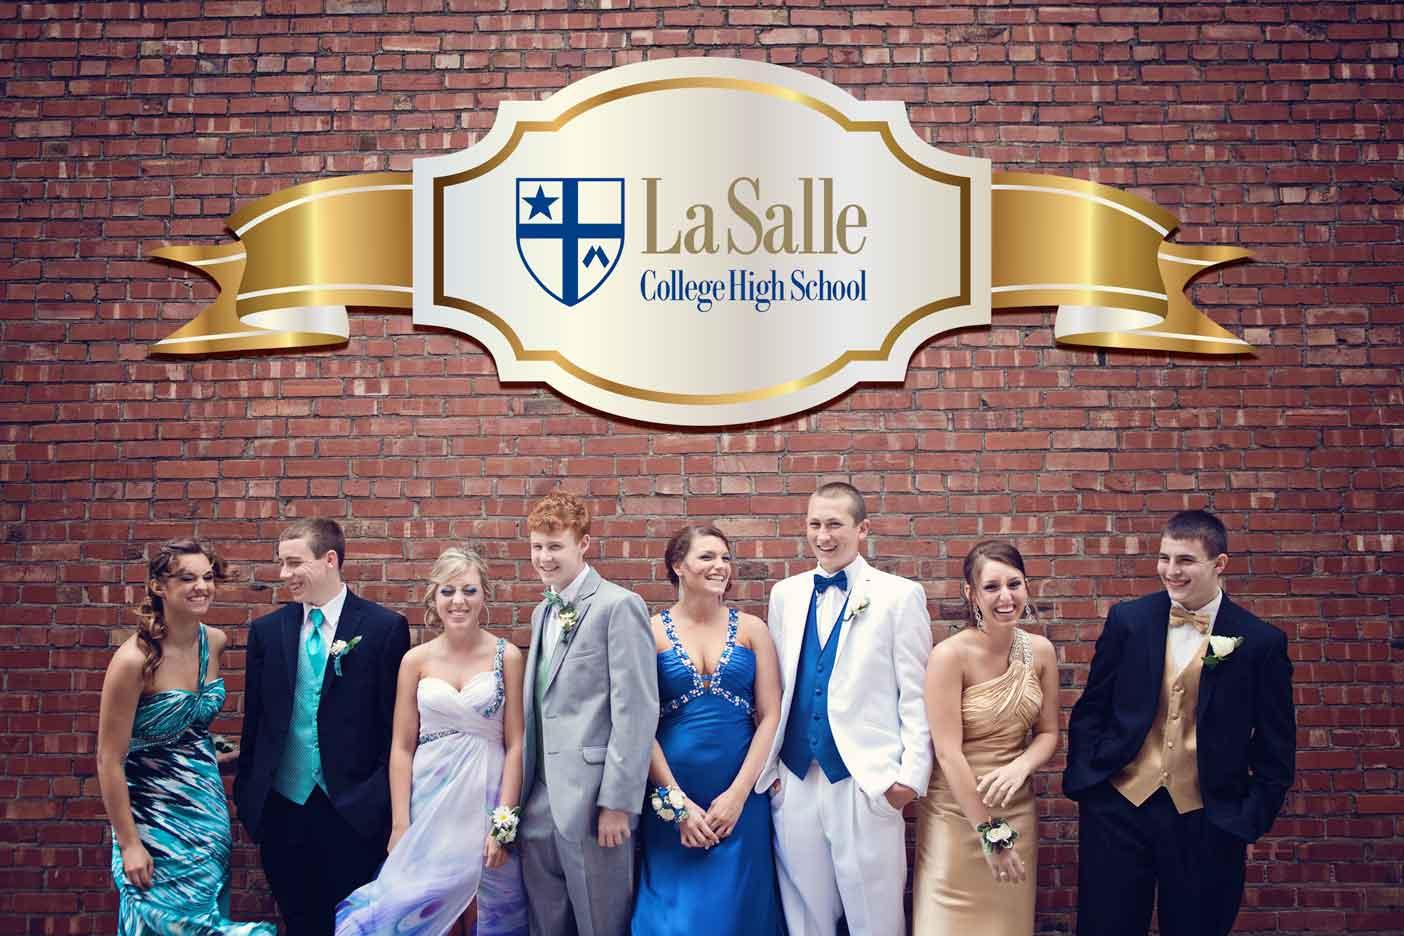 lasalle college high school prom